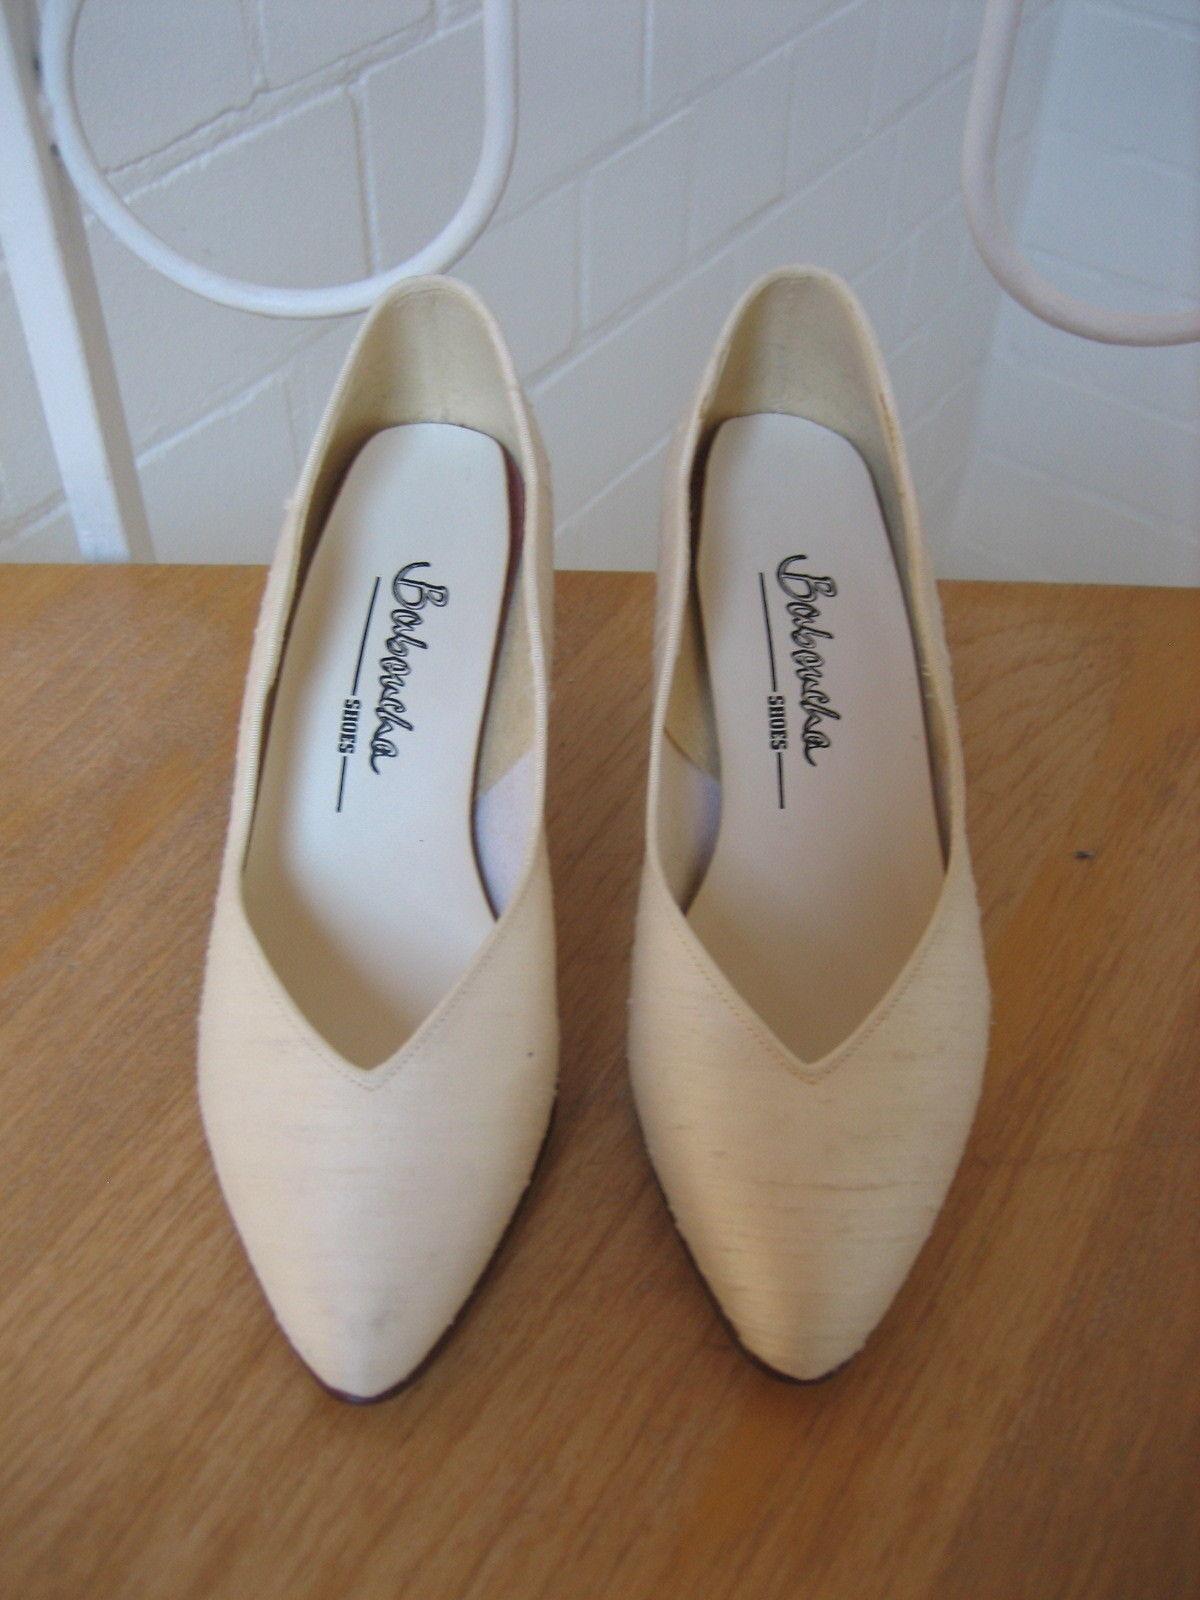 Bridal shoes/Wild Silk Shoes Pumps V. baboucha Shoes (Size 36) Cream/Ivory